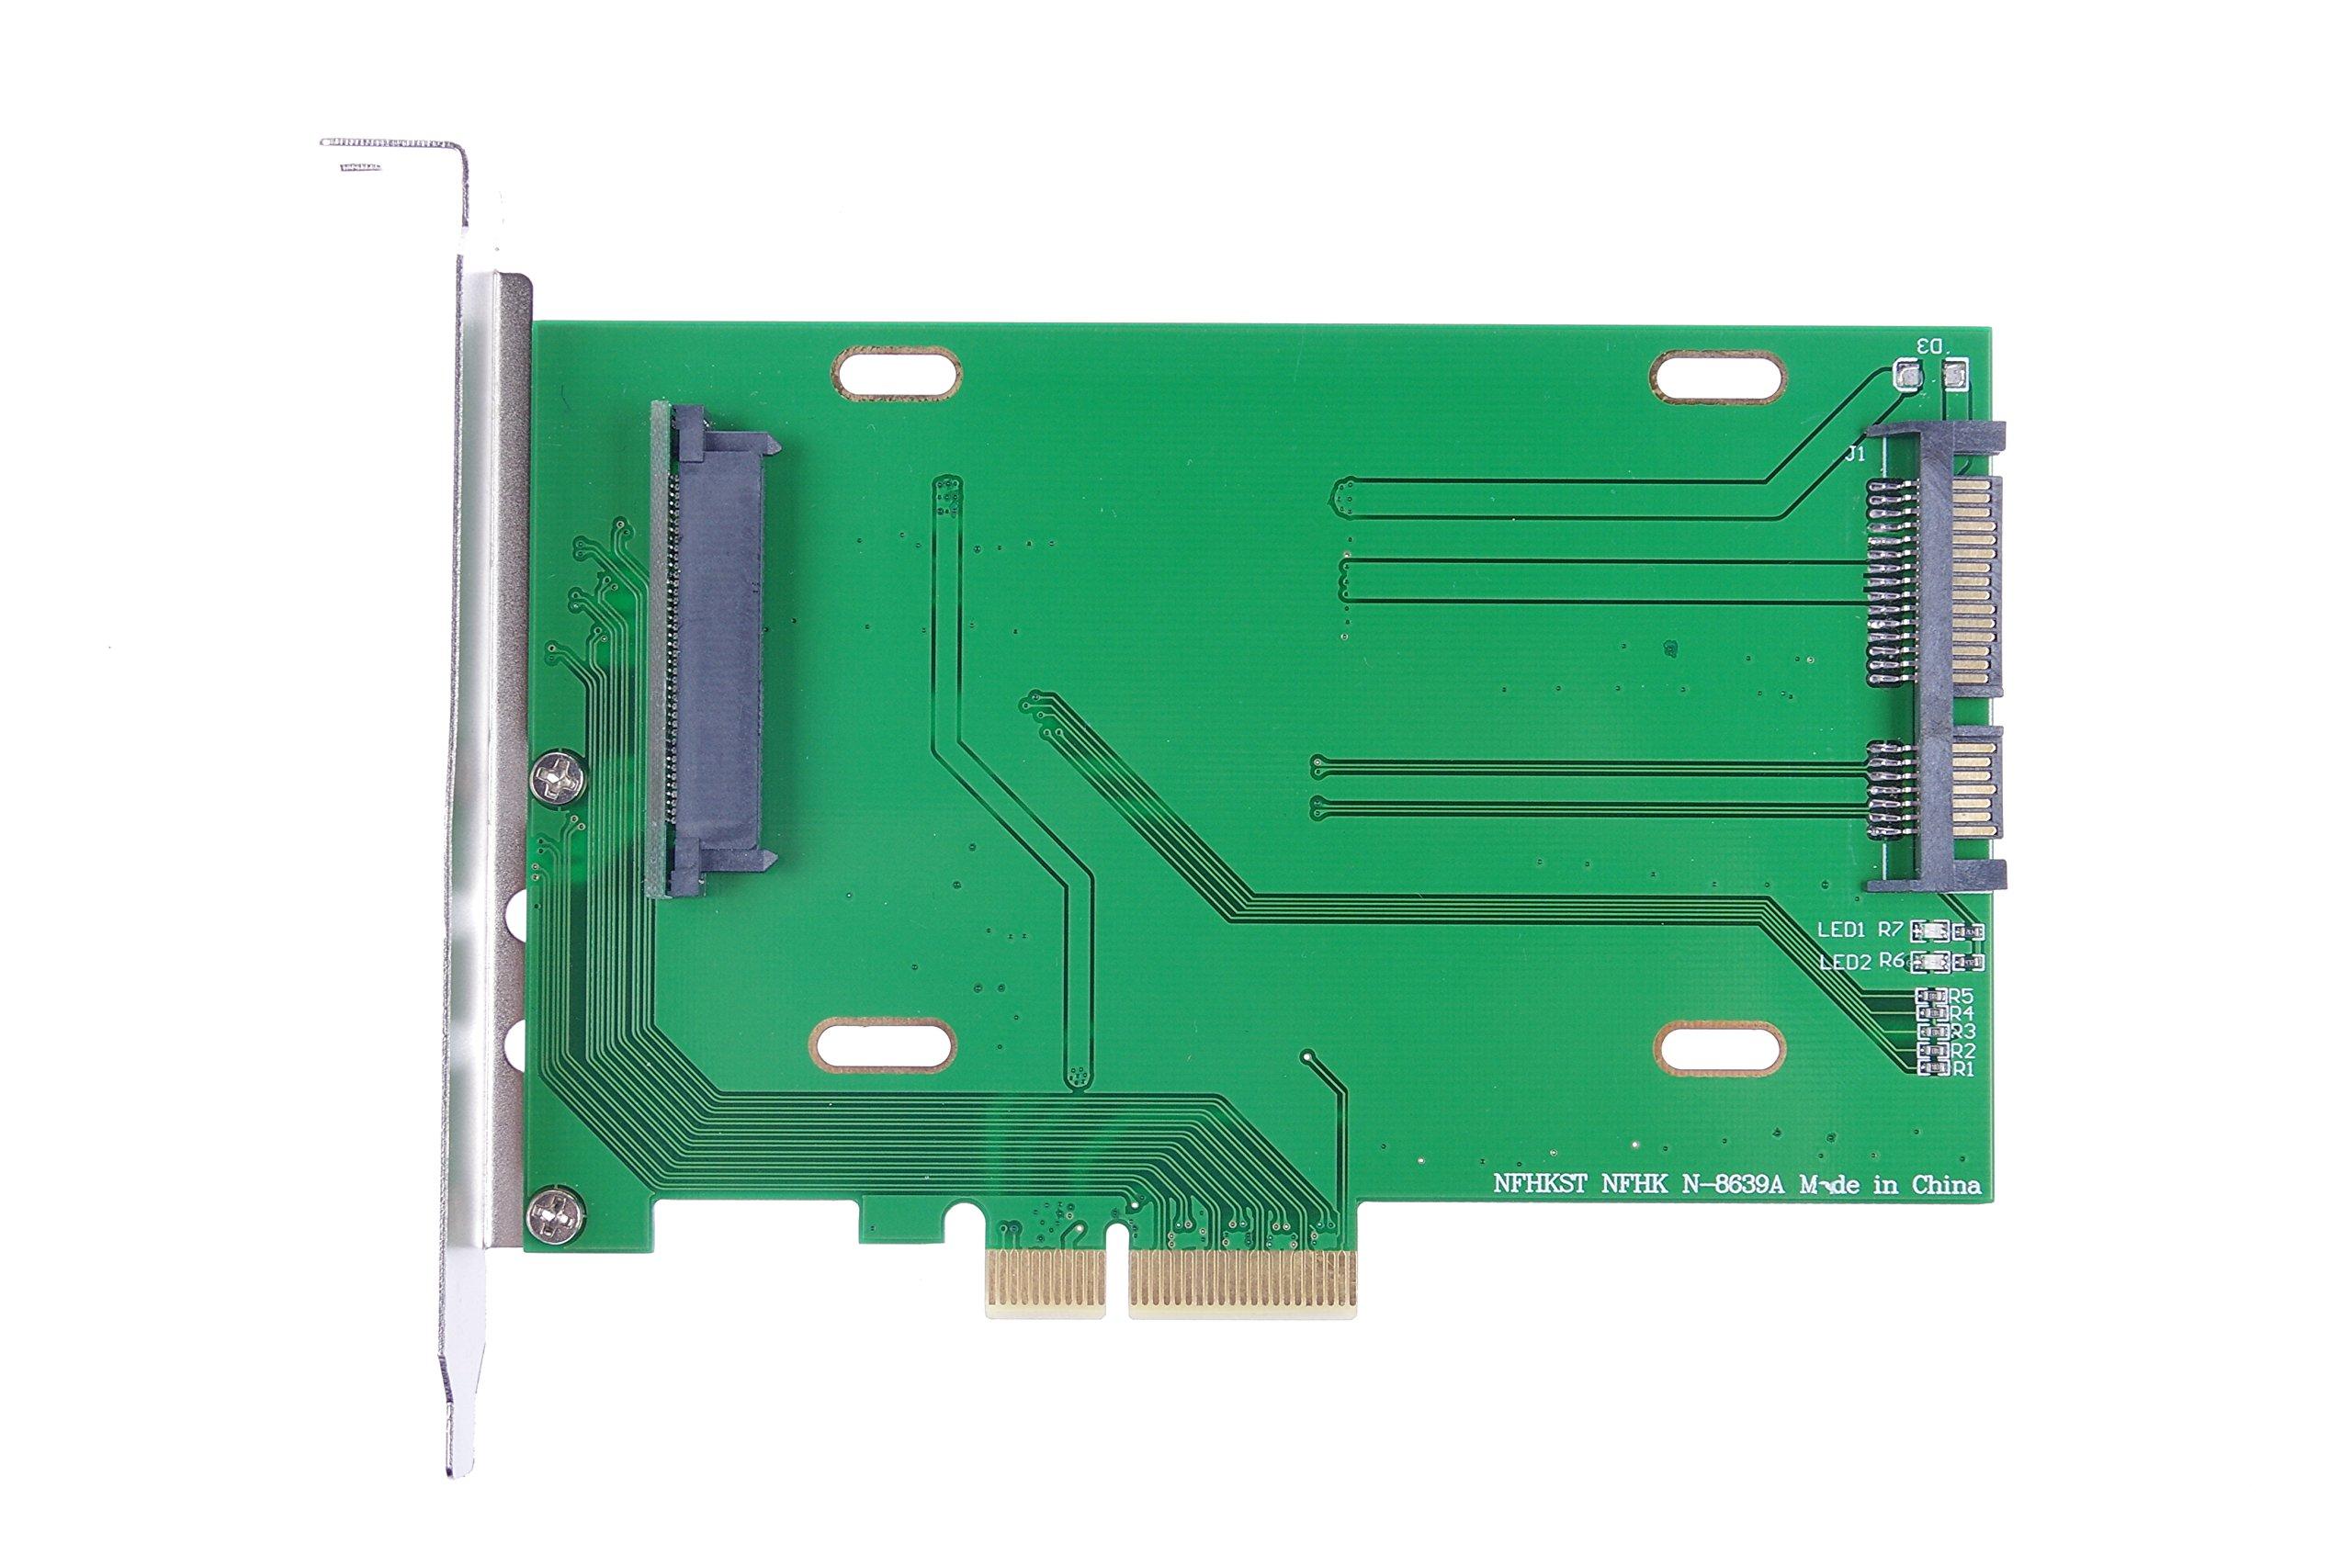 KNACRO PCI-E 3.0 x4 Lane to U.2 U2 Kit SFF-8639 Host Adapter for Intel Motherboard & 750 NVMe PCIe SSD by KNACRO